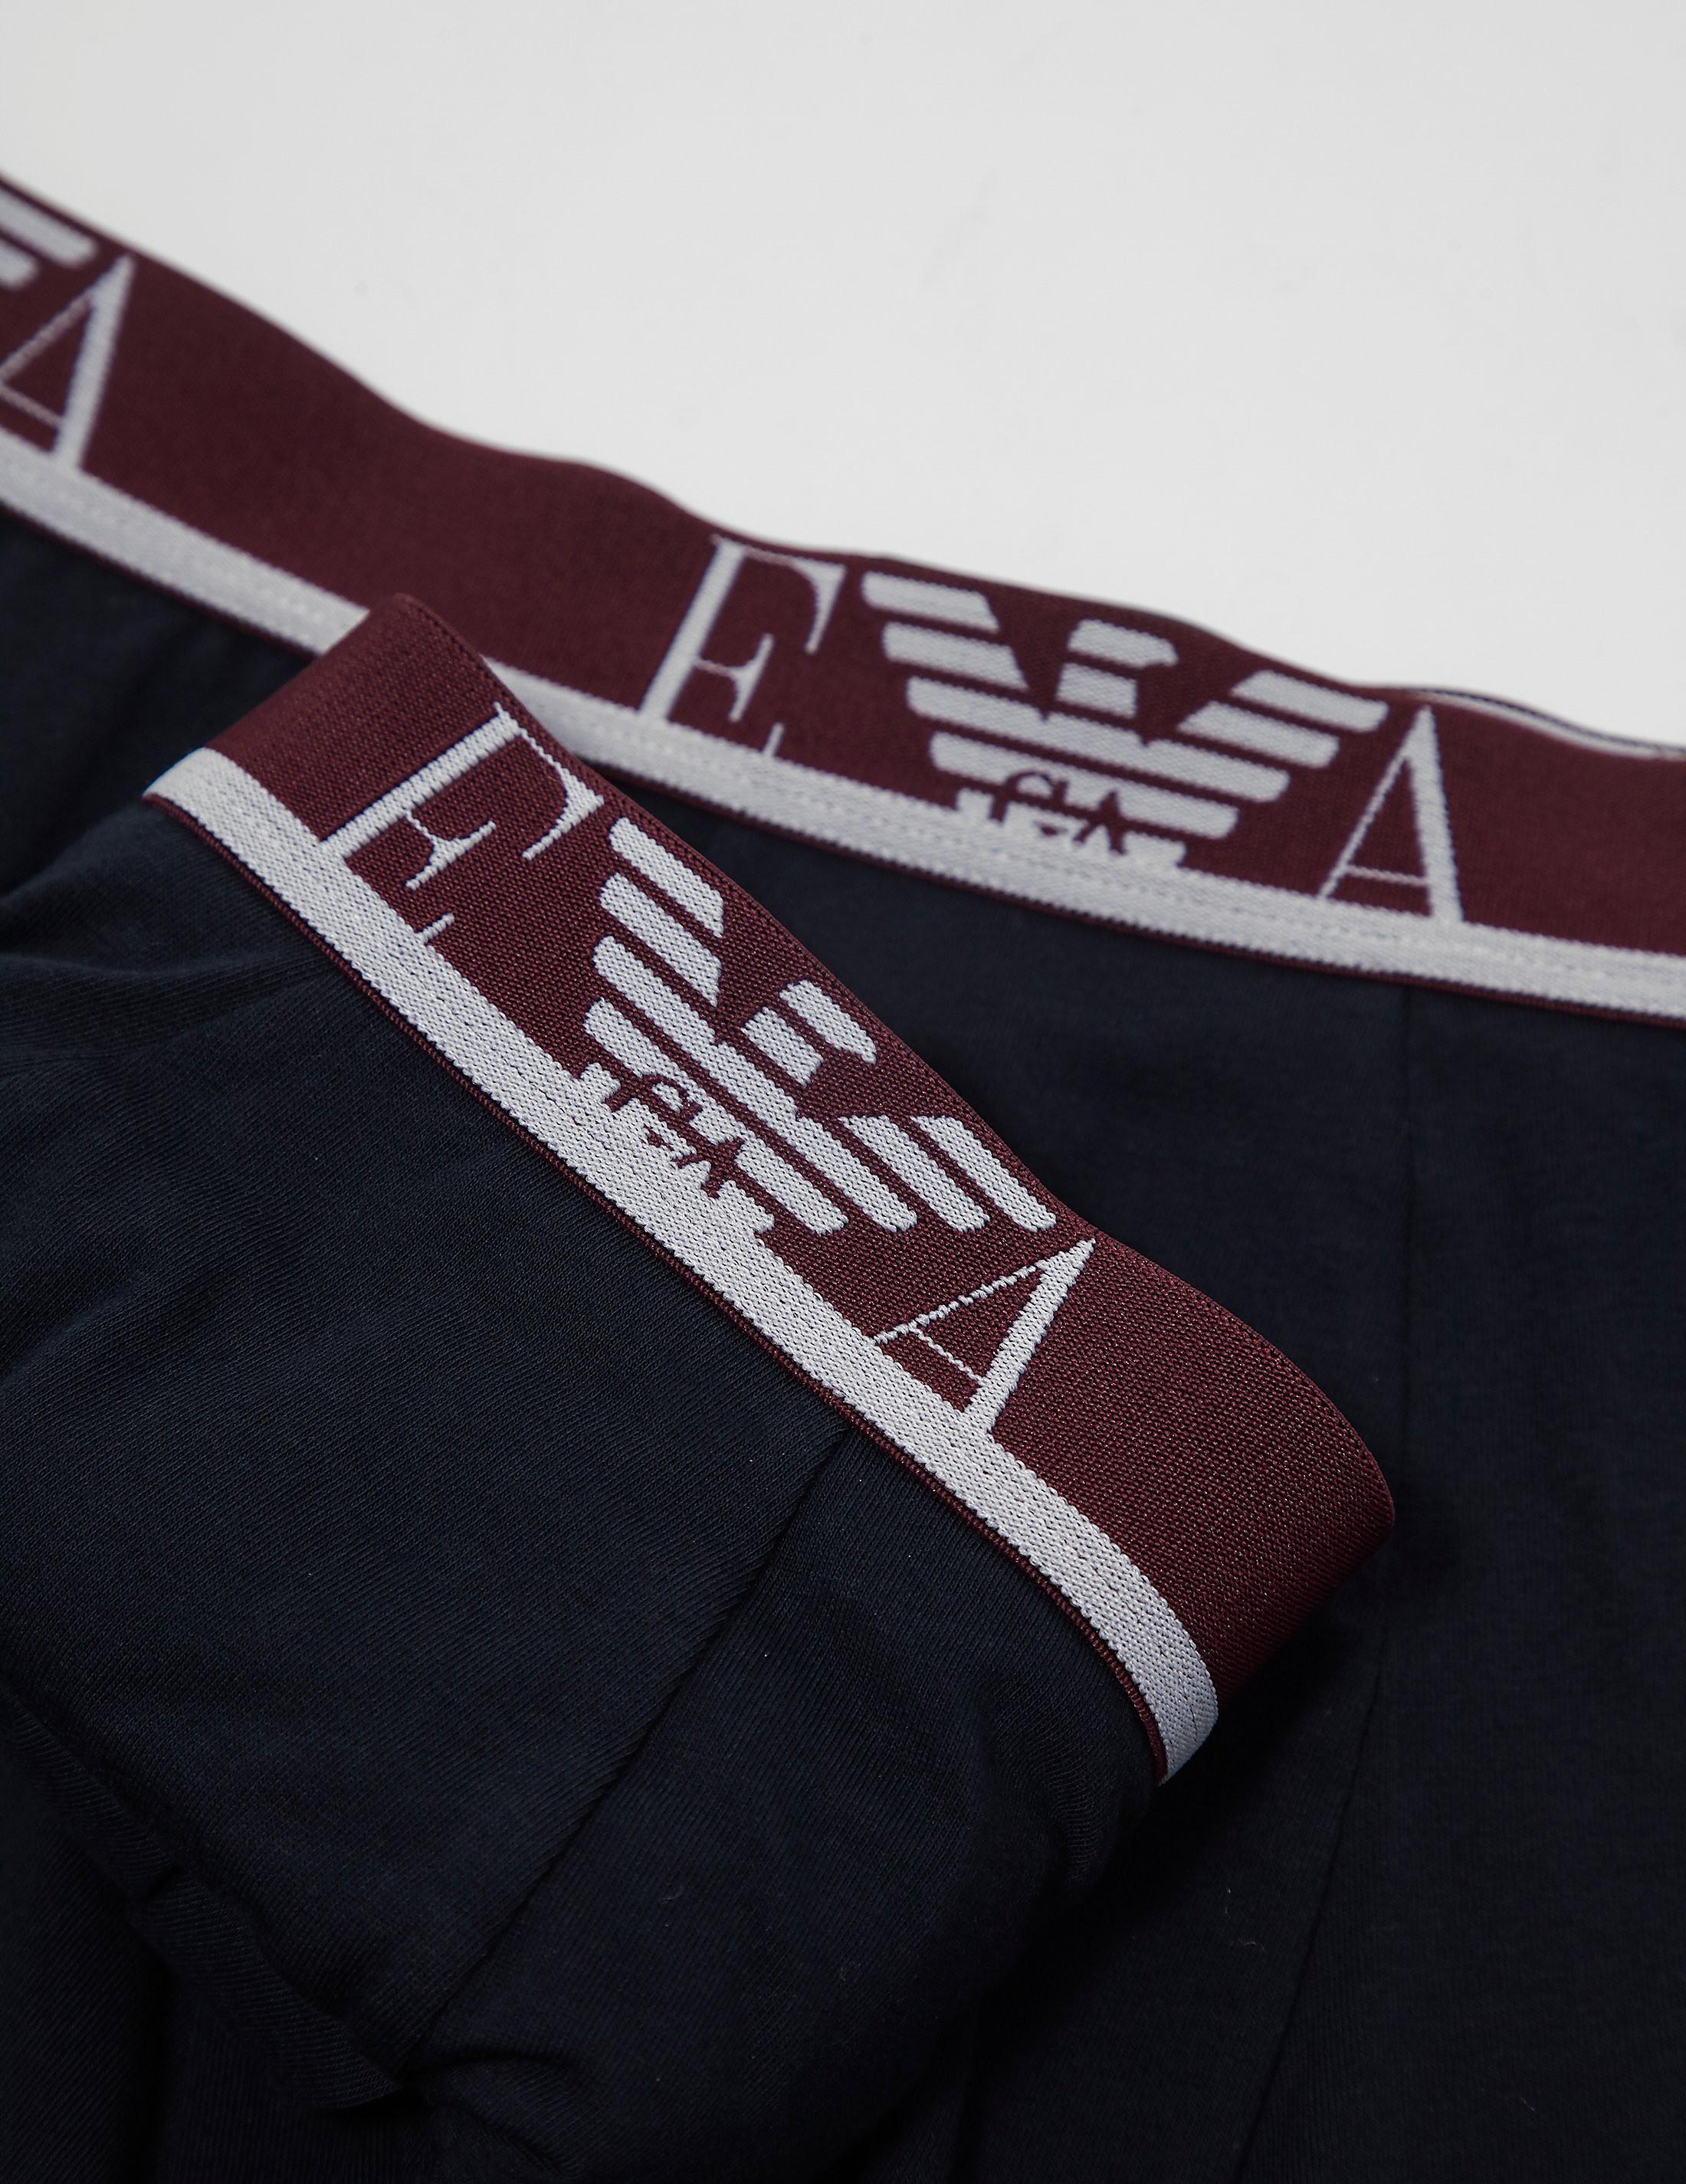 Emporio Armani 2-Pack Boxer Shorts